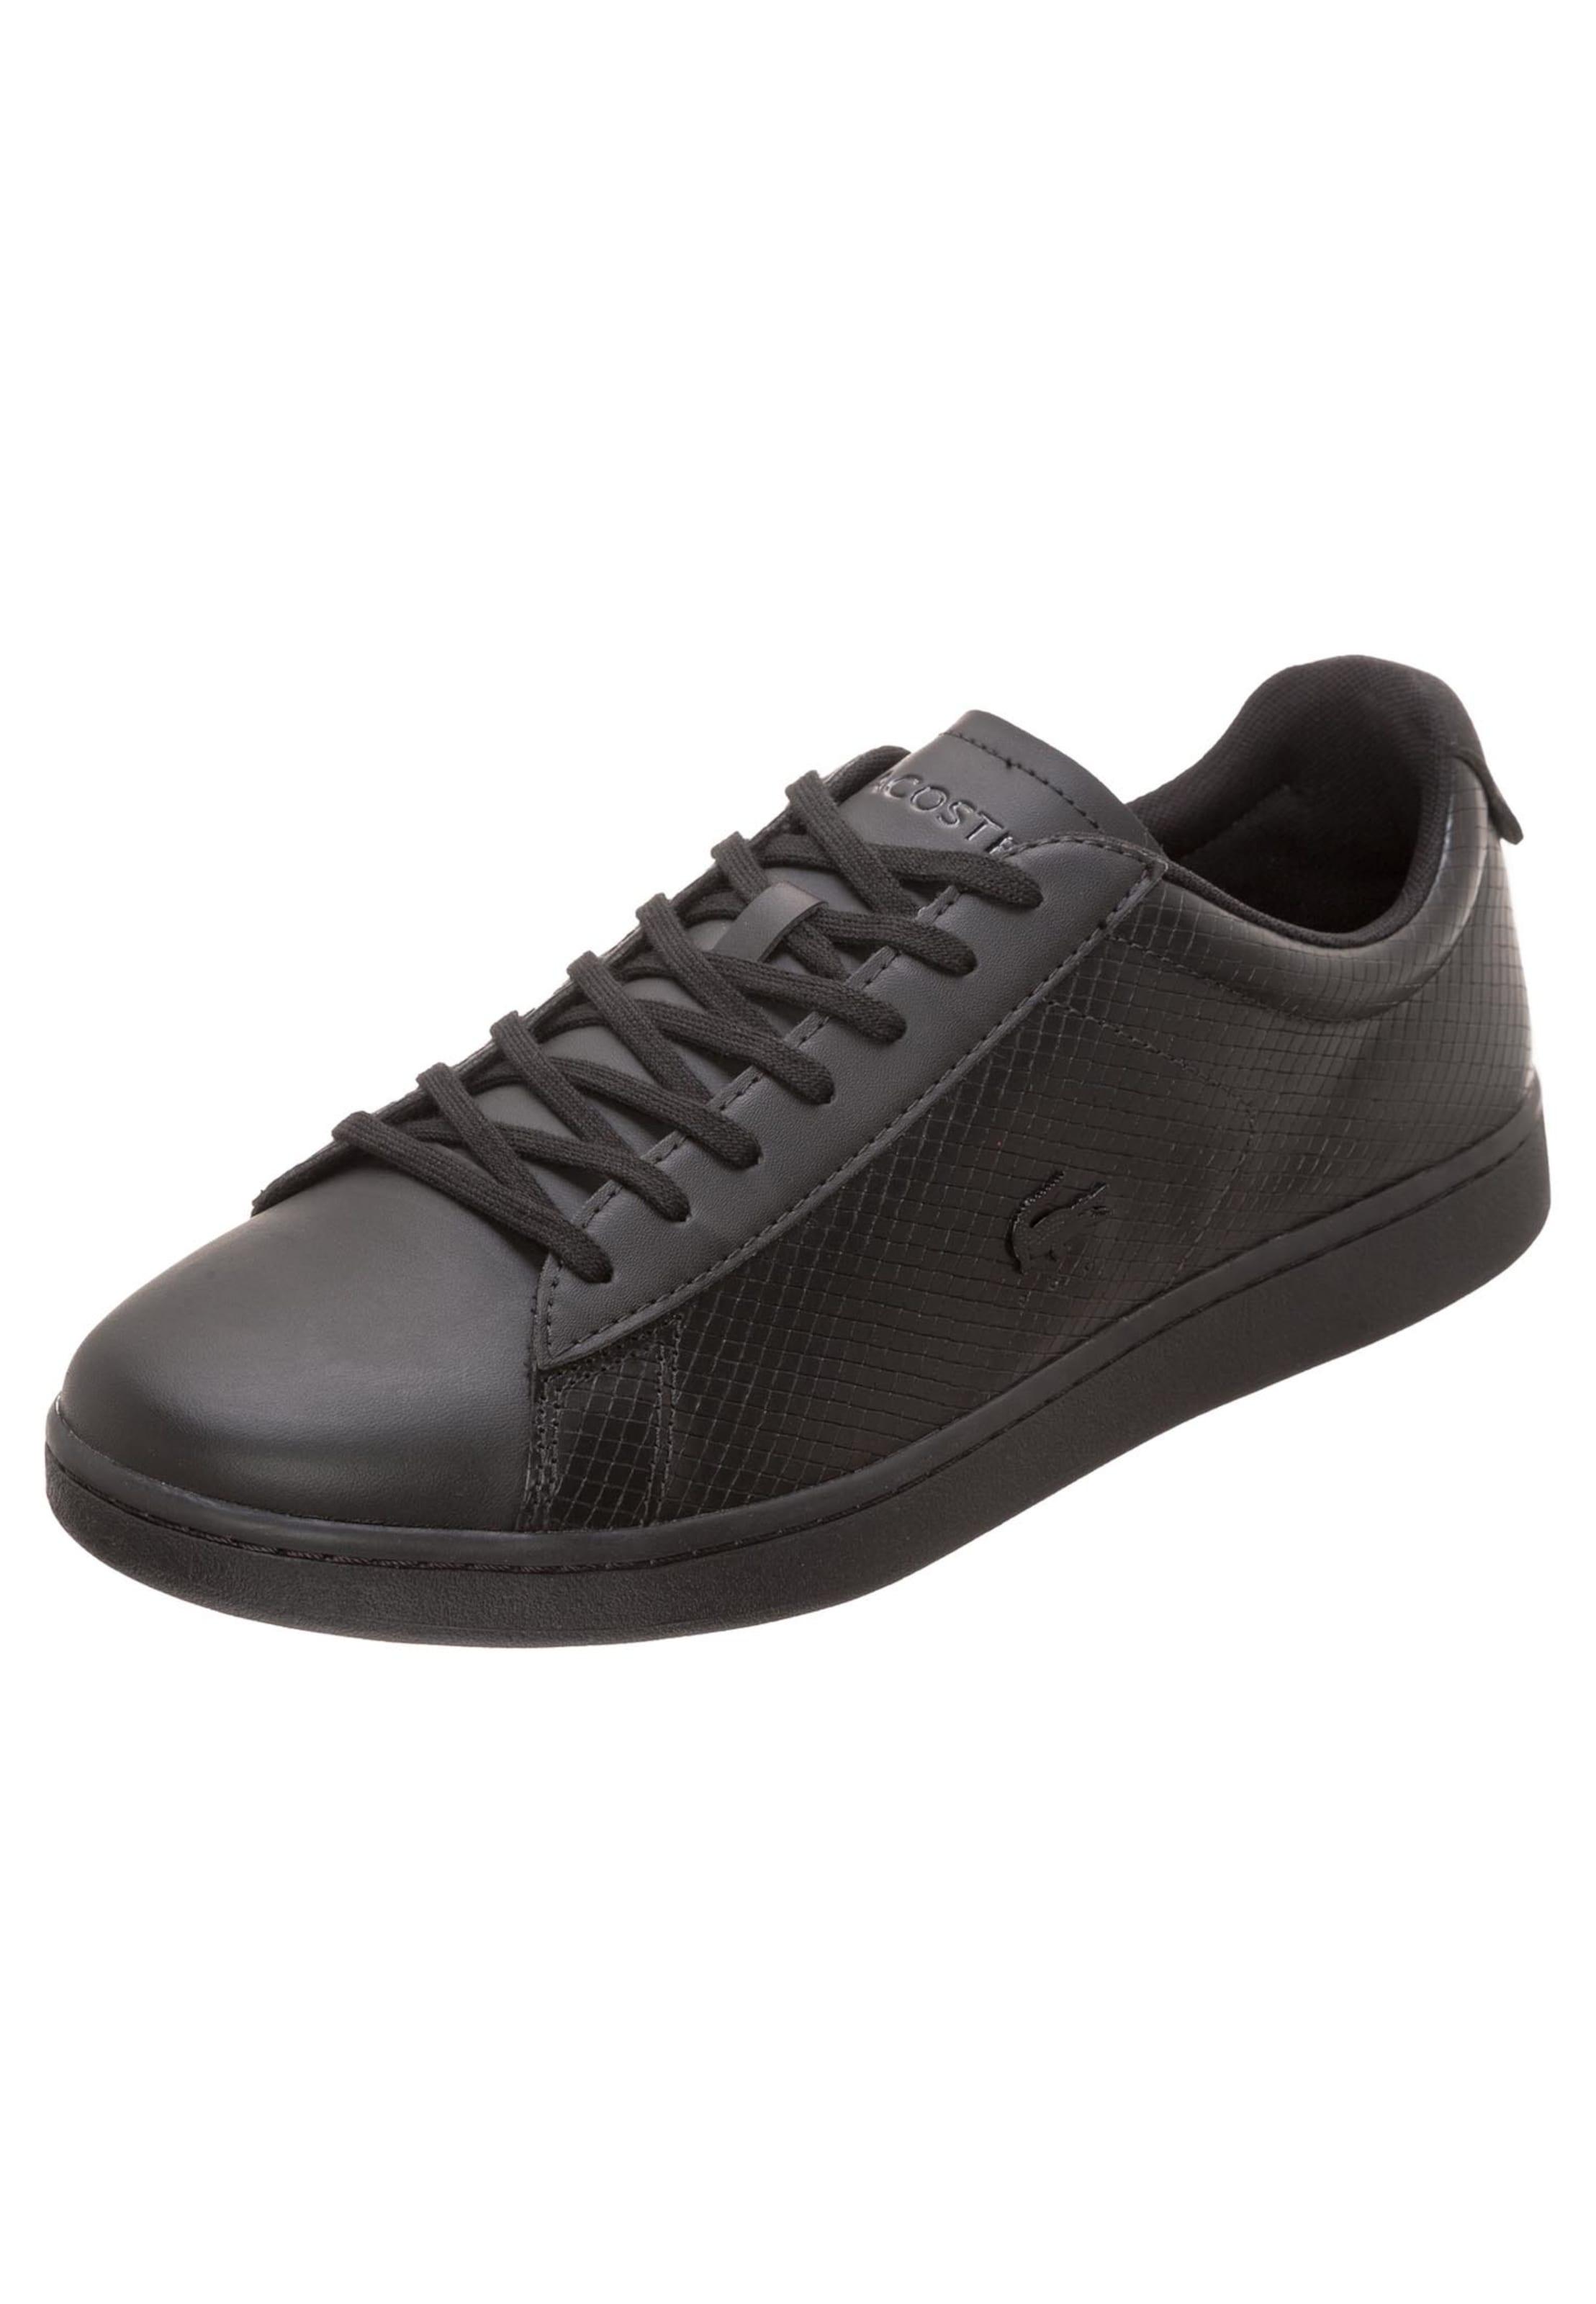 Evo' 'carnaby Sneaker In Lacoste Schwarz xCQhdstrBo